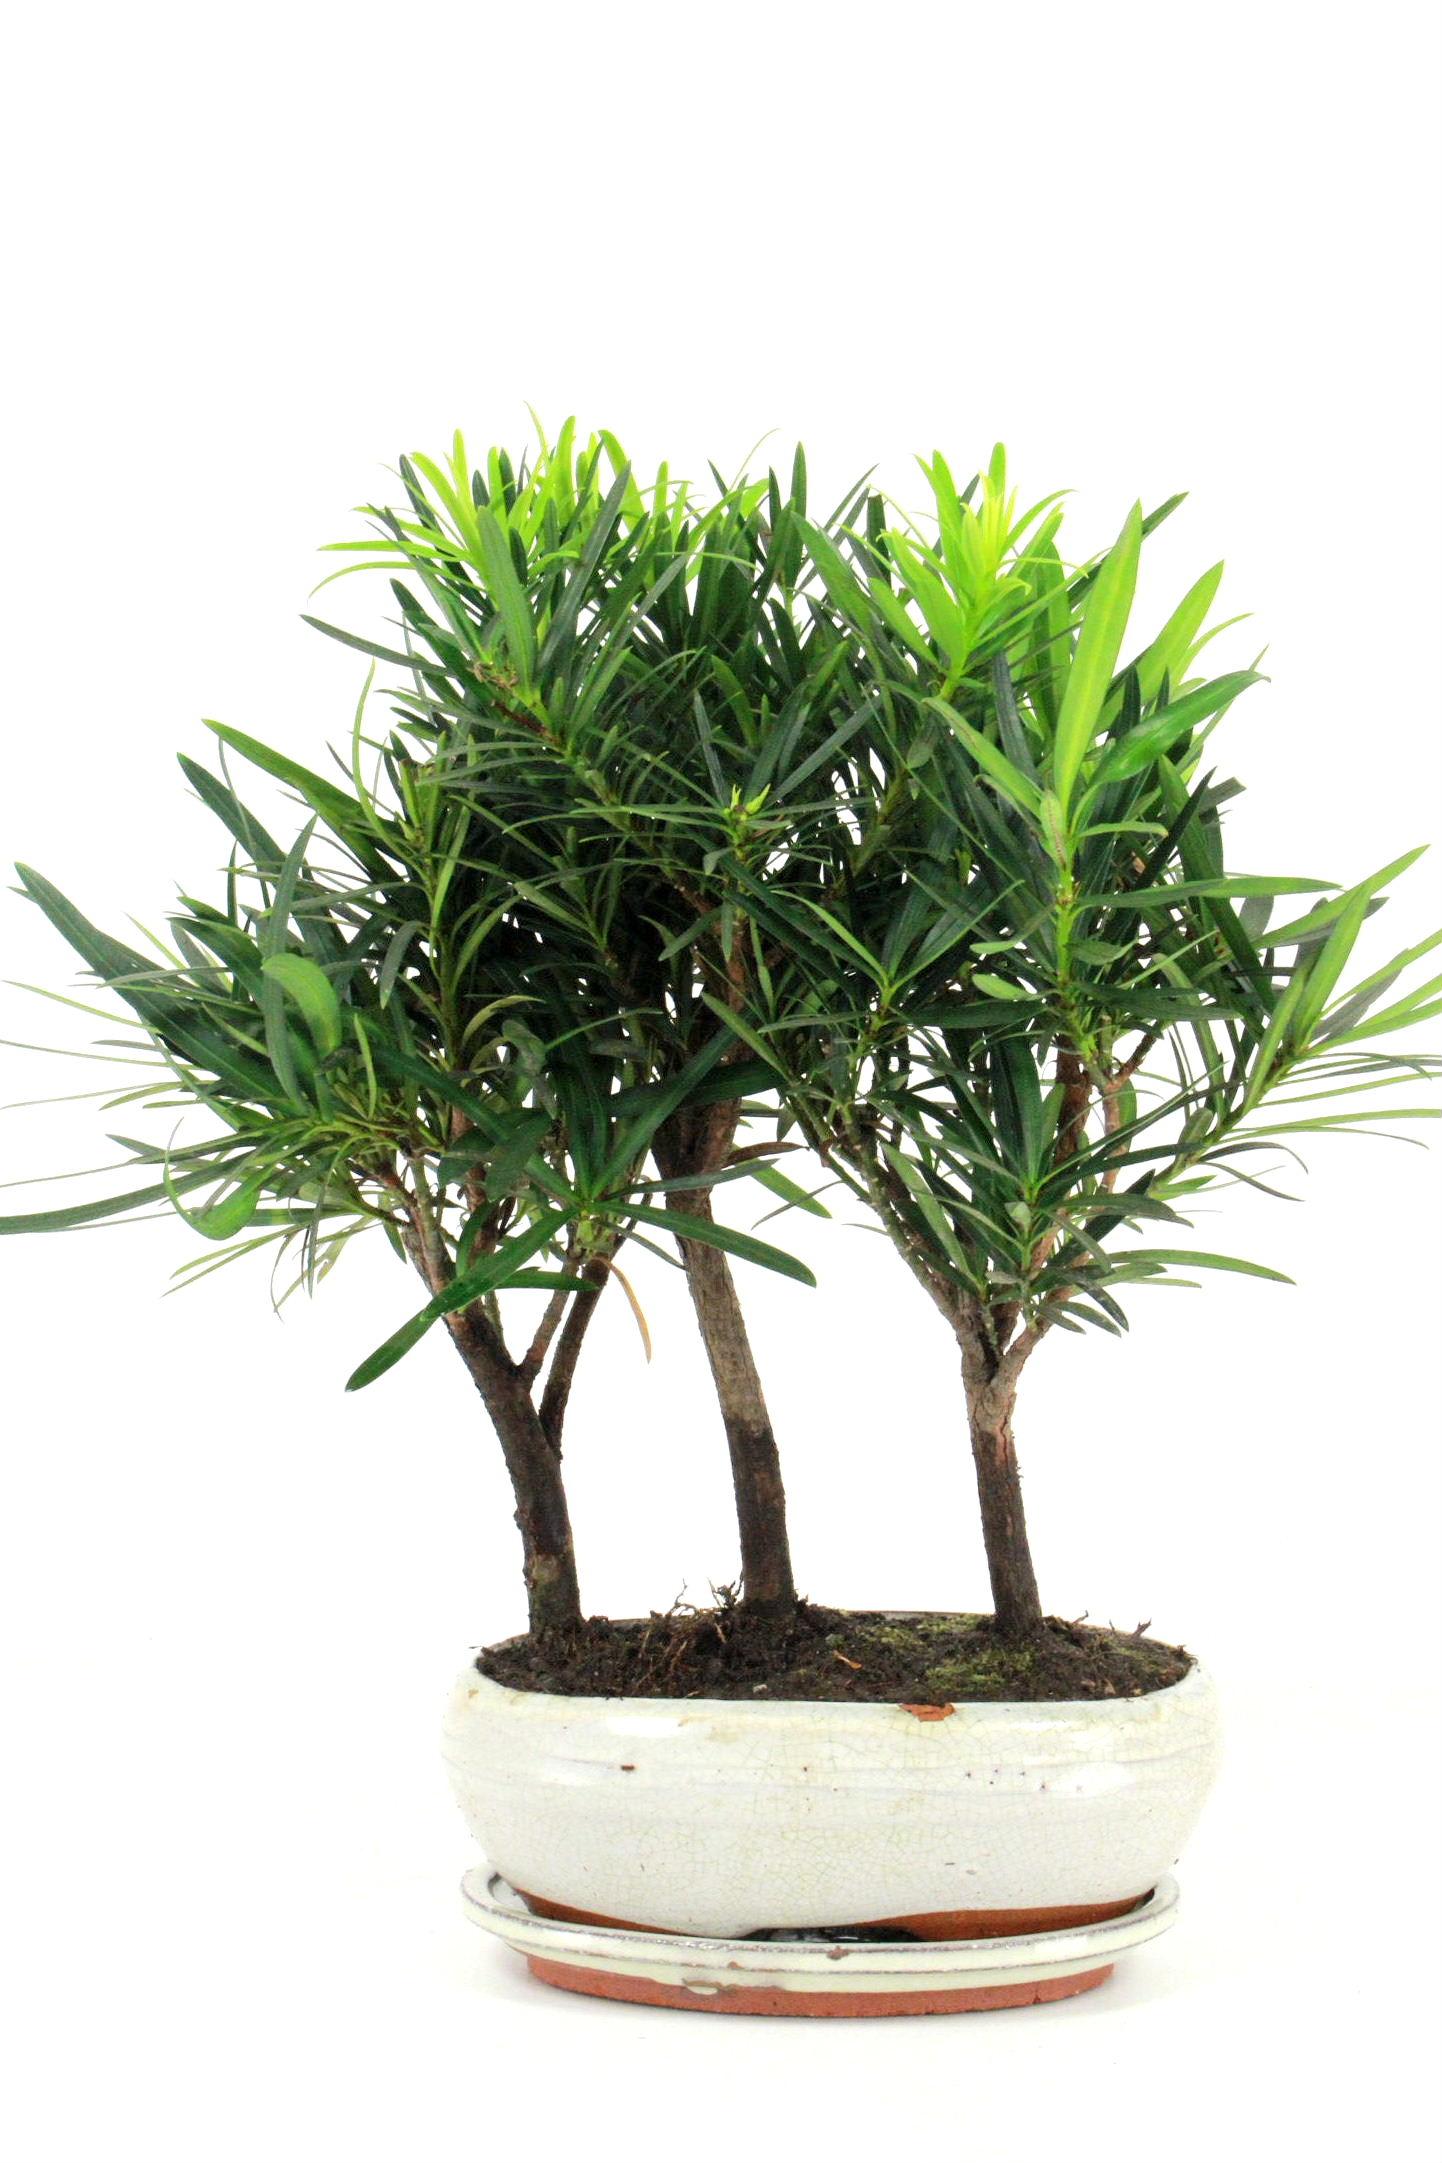 steineibe bonsai gruppenpflanzung 35 40 cm 2123 bei oyaki. Black Bedroom Furniture Sets. Home Design Ideas